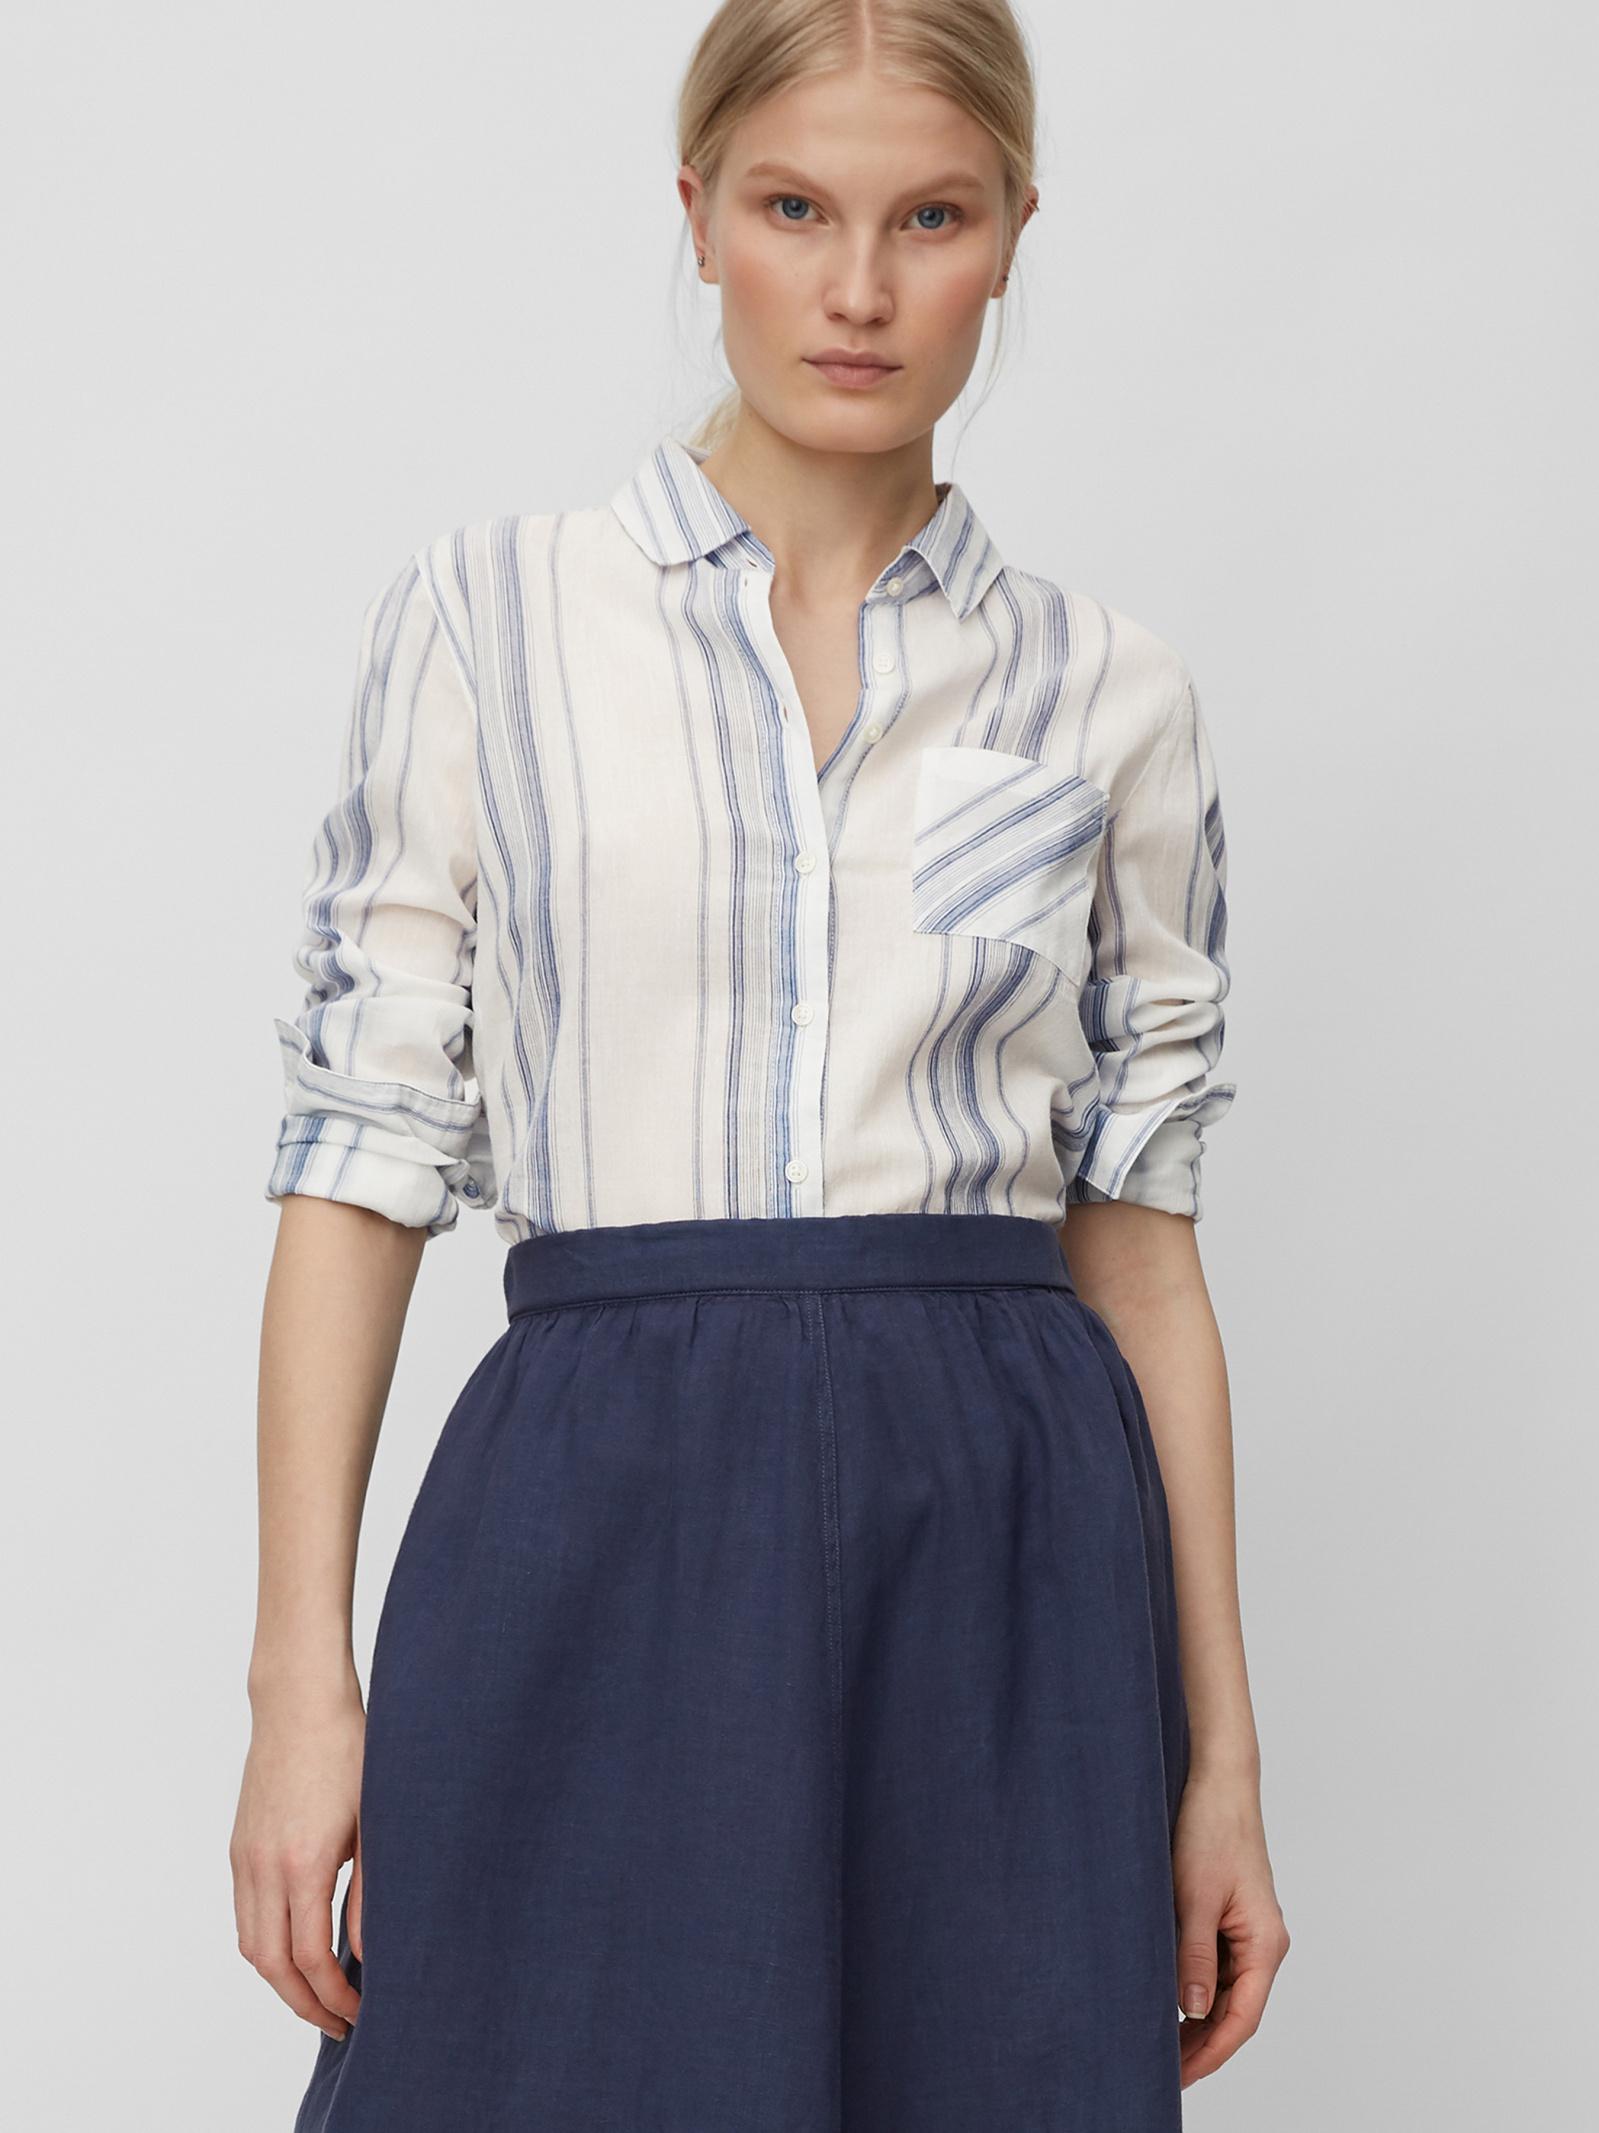 Блуза жіноча Marc O'Polo модель 004135342525-G69 - фото